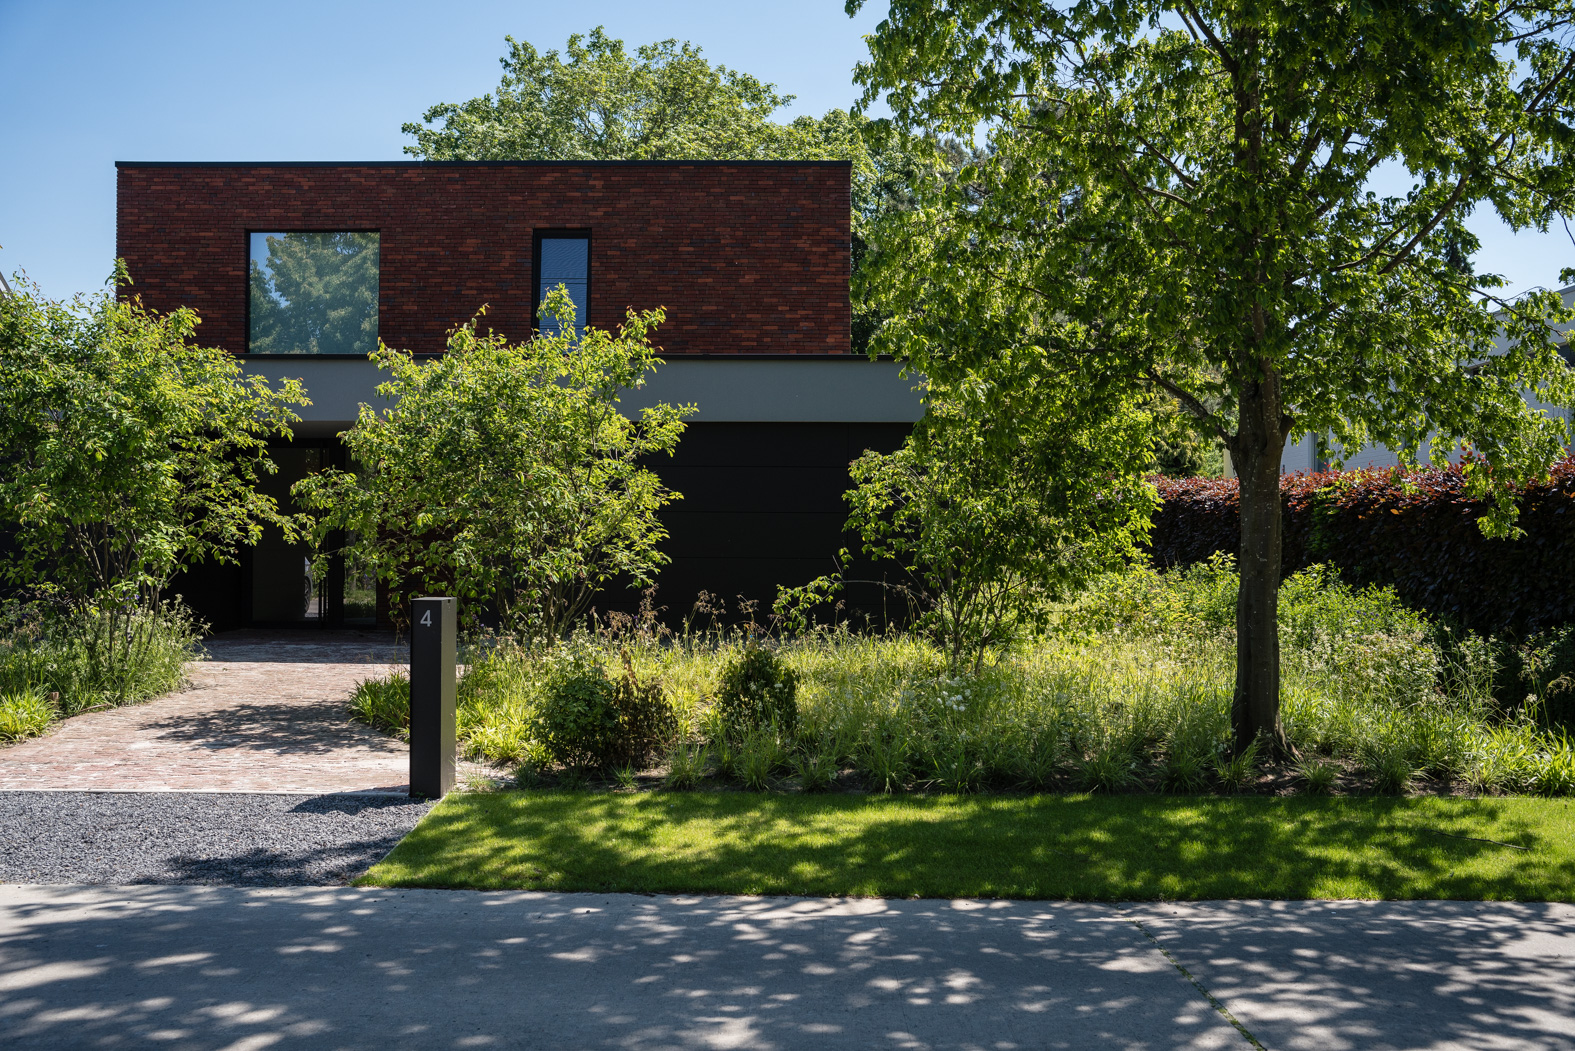 052021 WVV Hogerhuis U665 LOWRES46 | Baeyens & Beck architecten Gent | architect nieuwbouw renovatie interieur | high end | architectenbureau